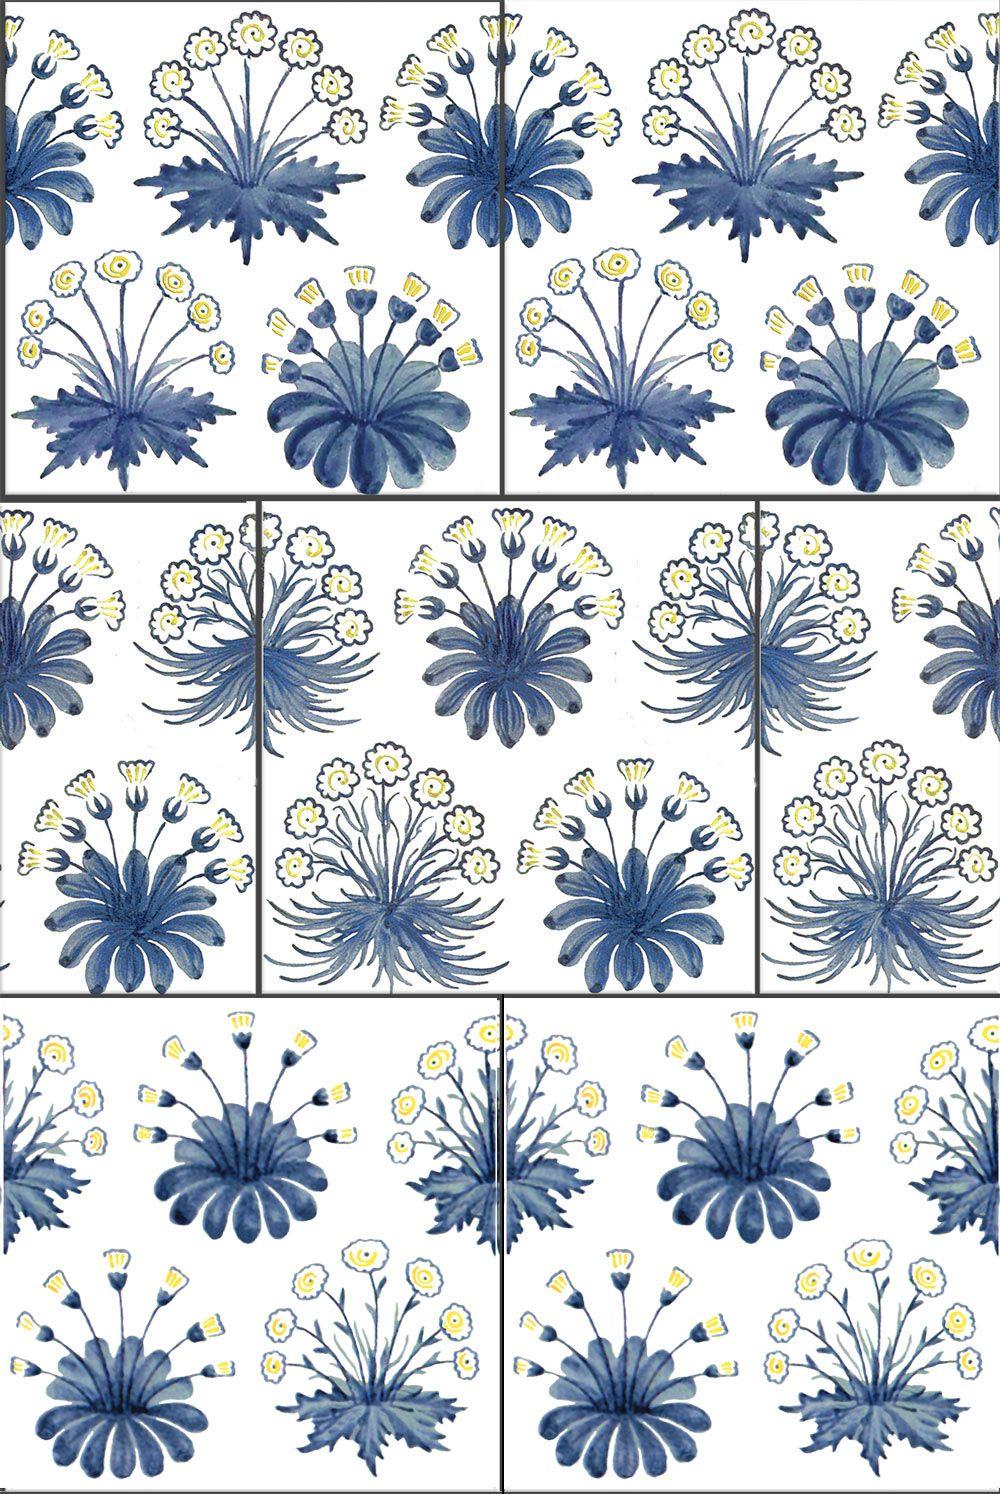 William Morris Daisy Tiles, 1860s-1882 | Your Pinterest likes ...